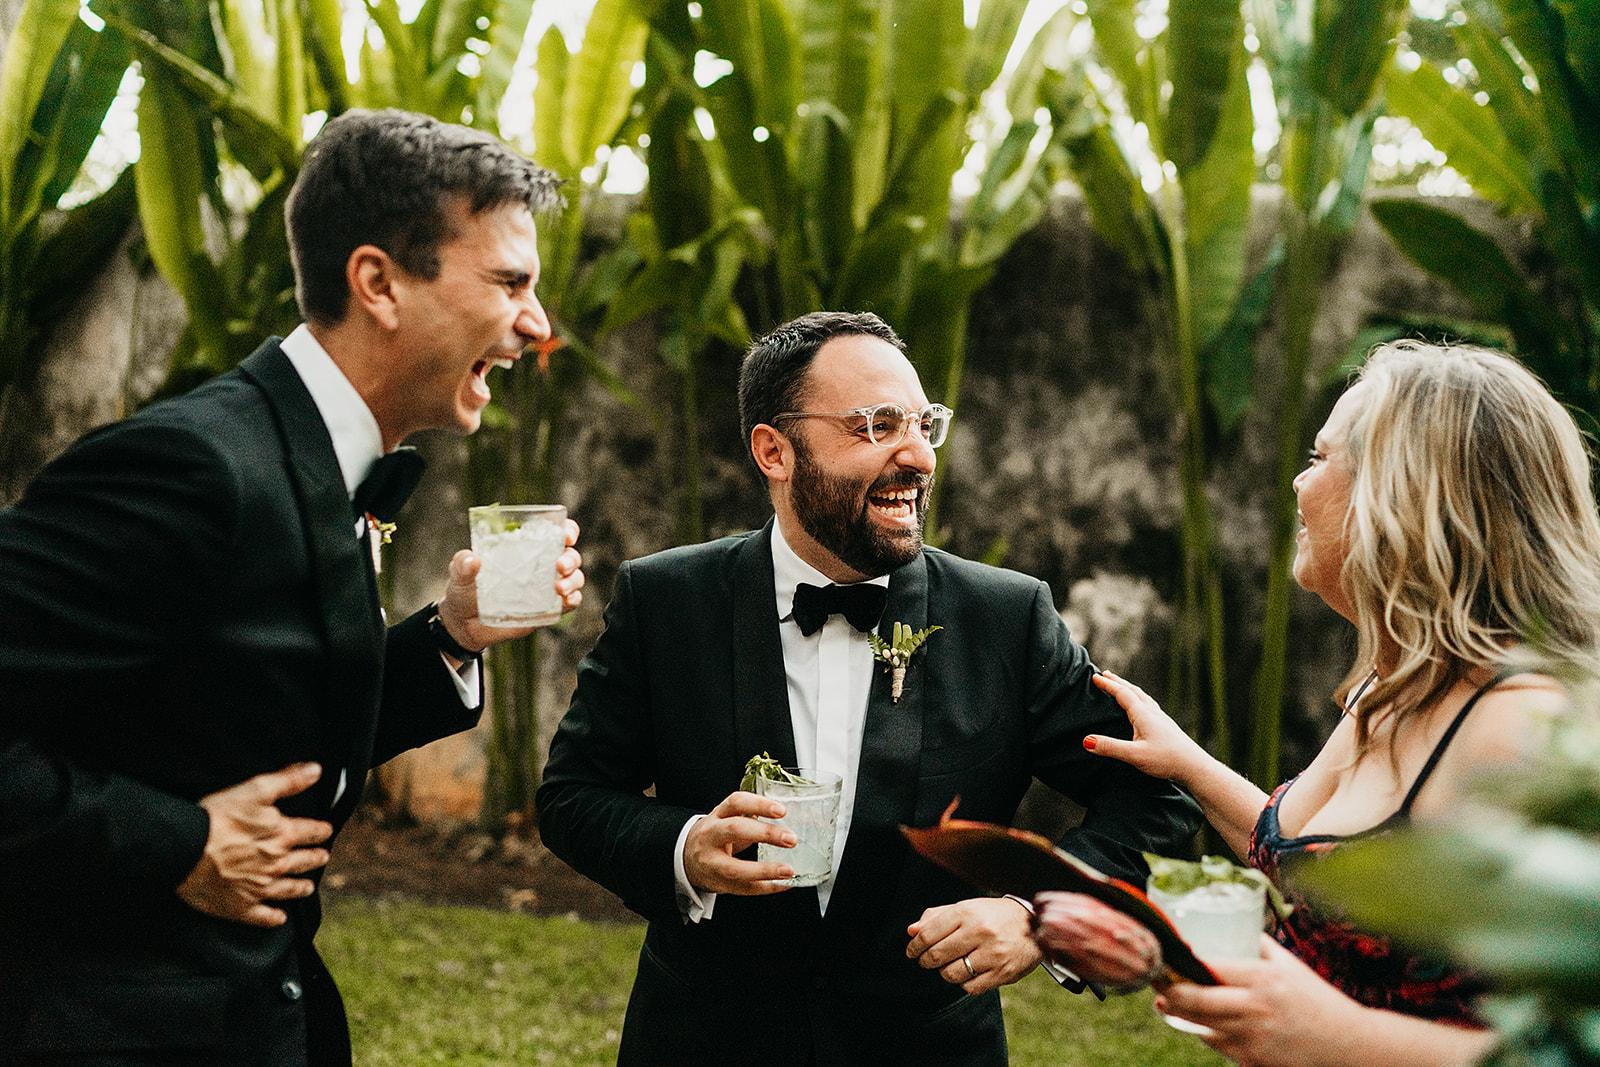 AmandaMarkus-Hacienda-Sac-Chich-Merida-Wedding-631_websize - Copy.jpg